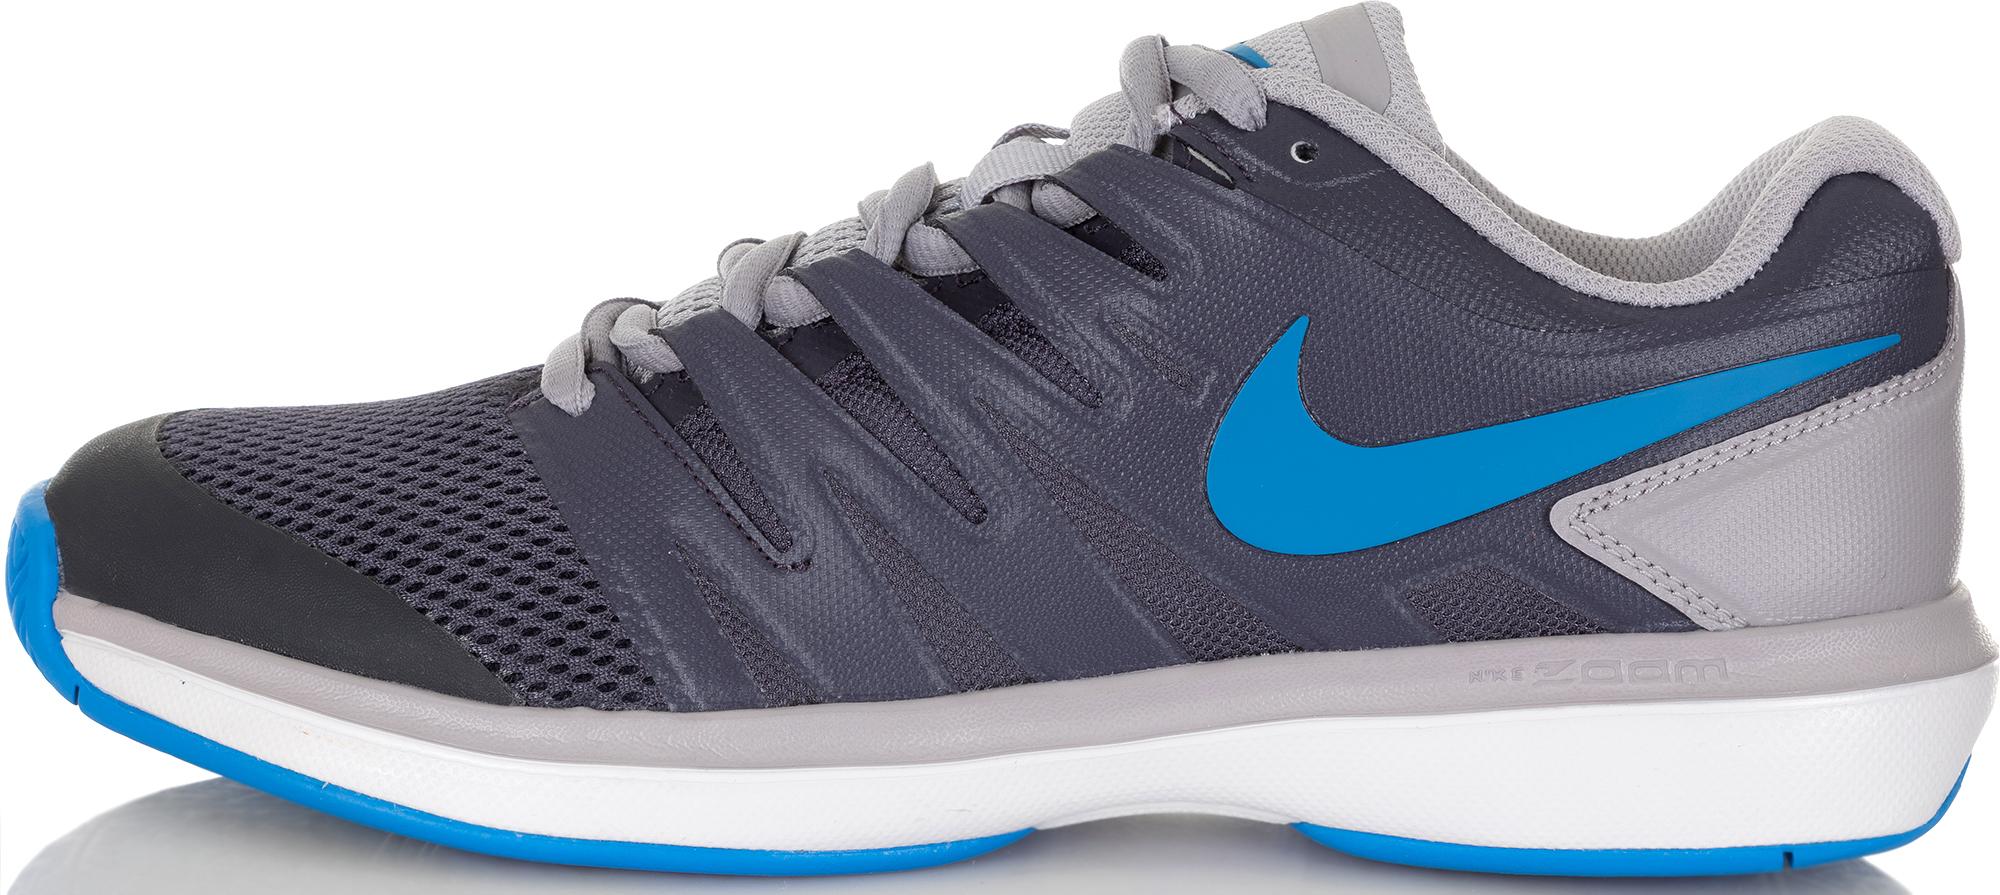 Nike Кроссовки мужские Nike Air Zoom Prestige, размер 46,5 цена